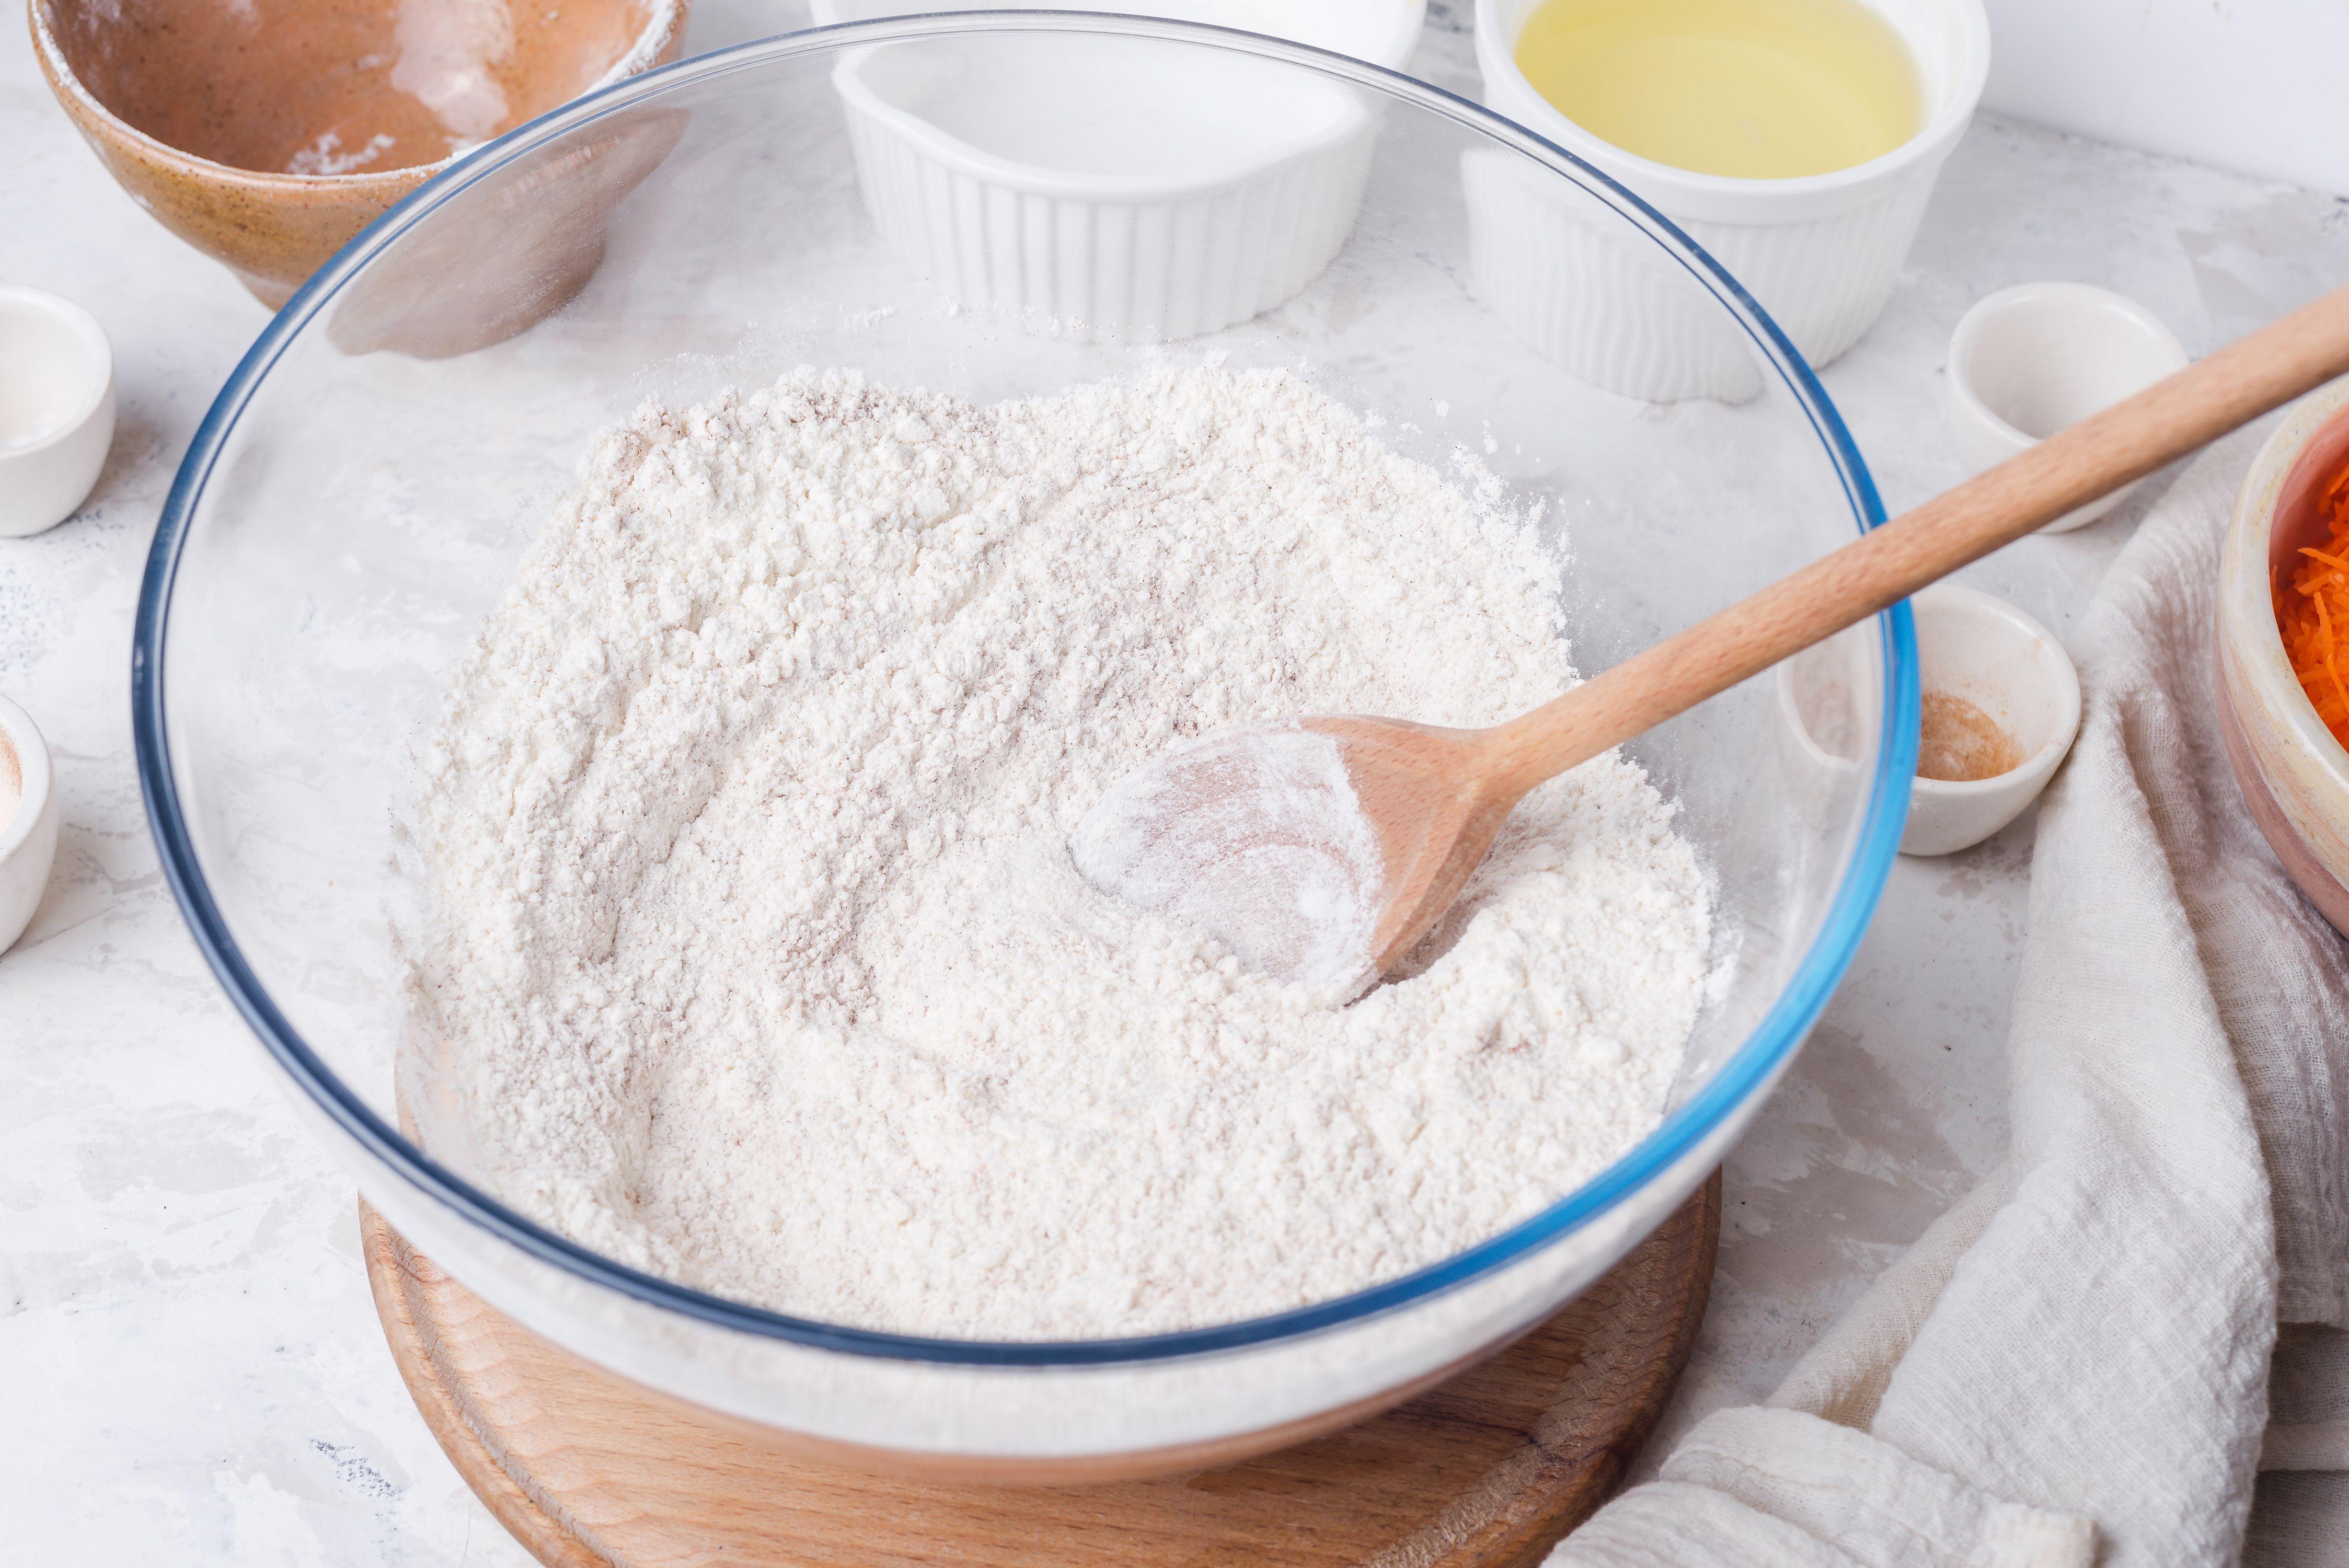 Gradually beat in powdered sugar